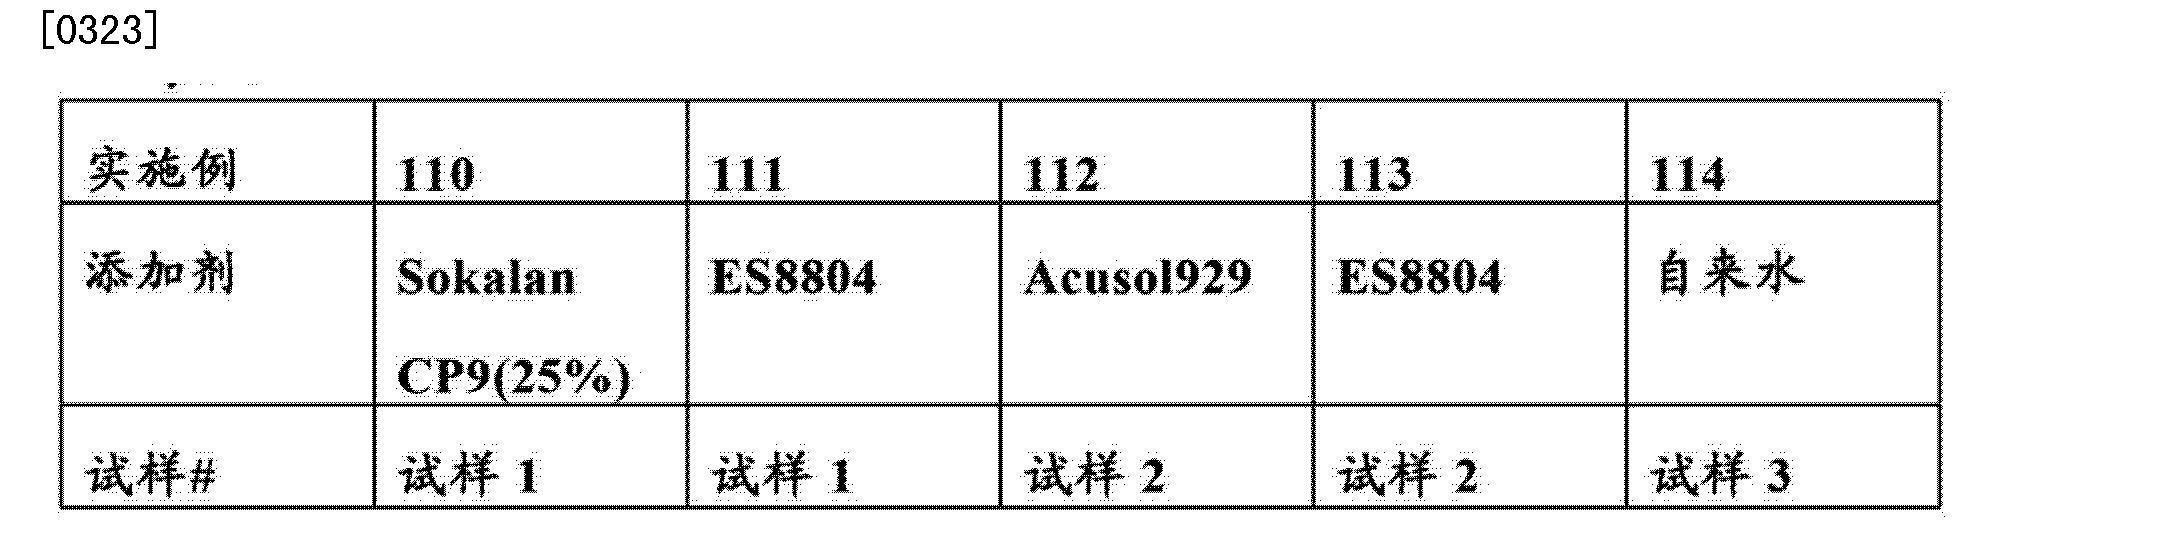 CN103328623B - Soil resistant floor cleaner - Google Patents